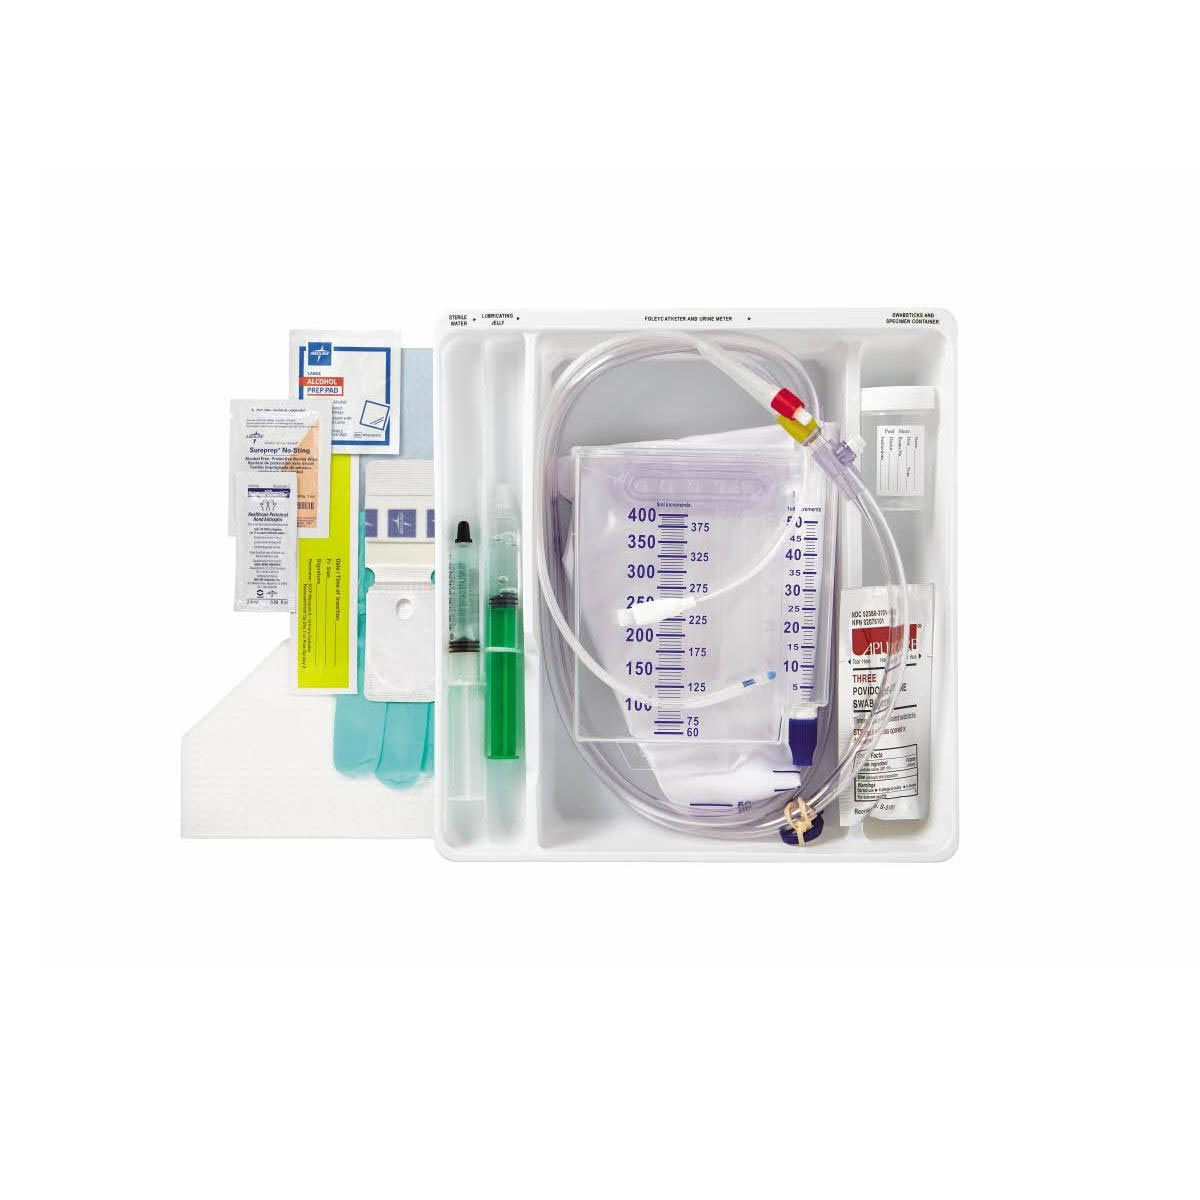 Medline 100% Silicone Foley Catheter Tray, Adult, 18Fr OD, 10cc Balloon